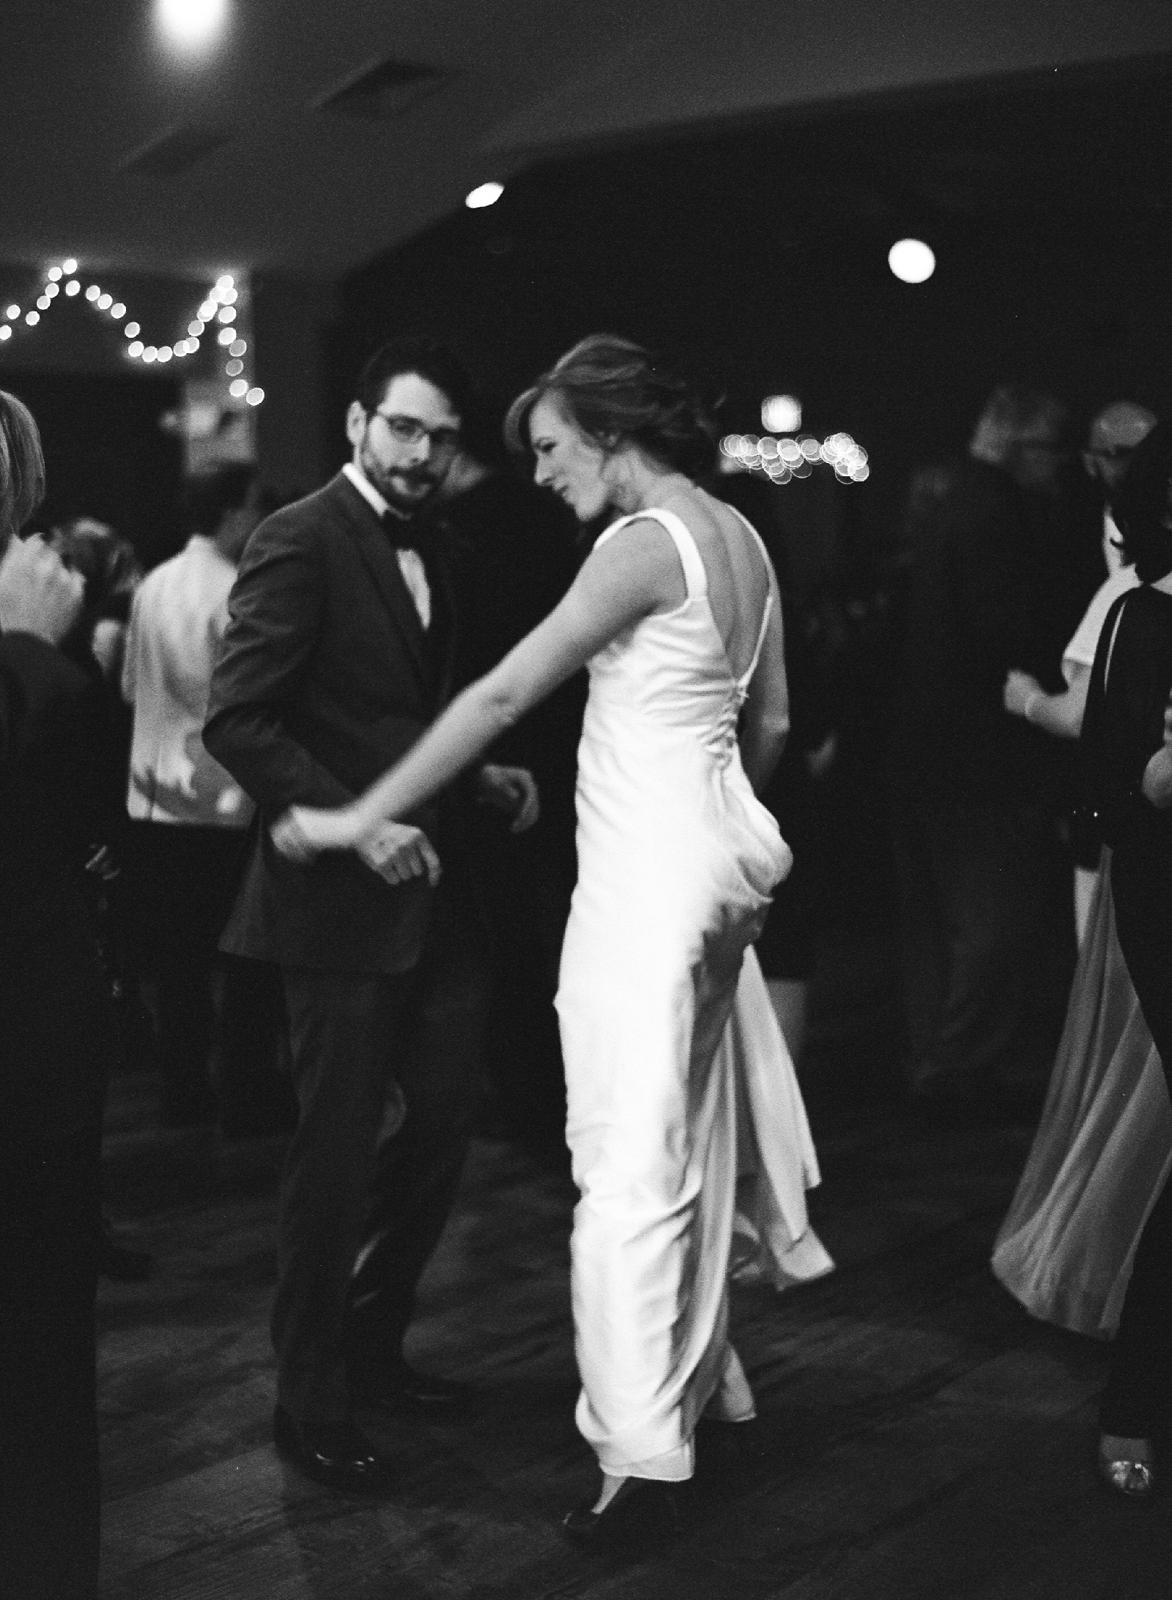 ringwood new jersey wedding photographer shannon griffin_0041.jpg